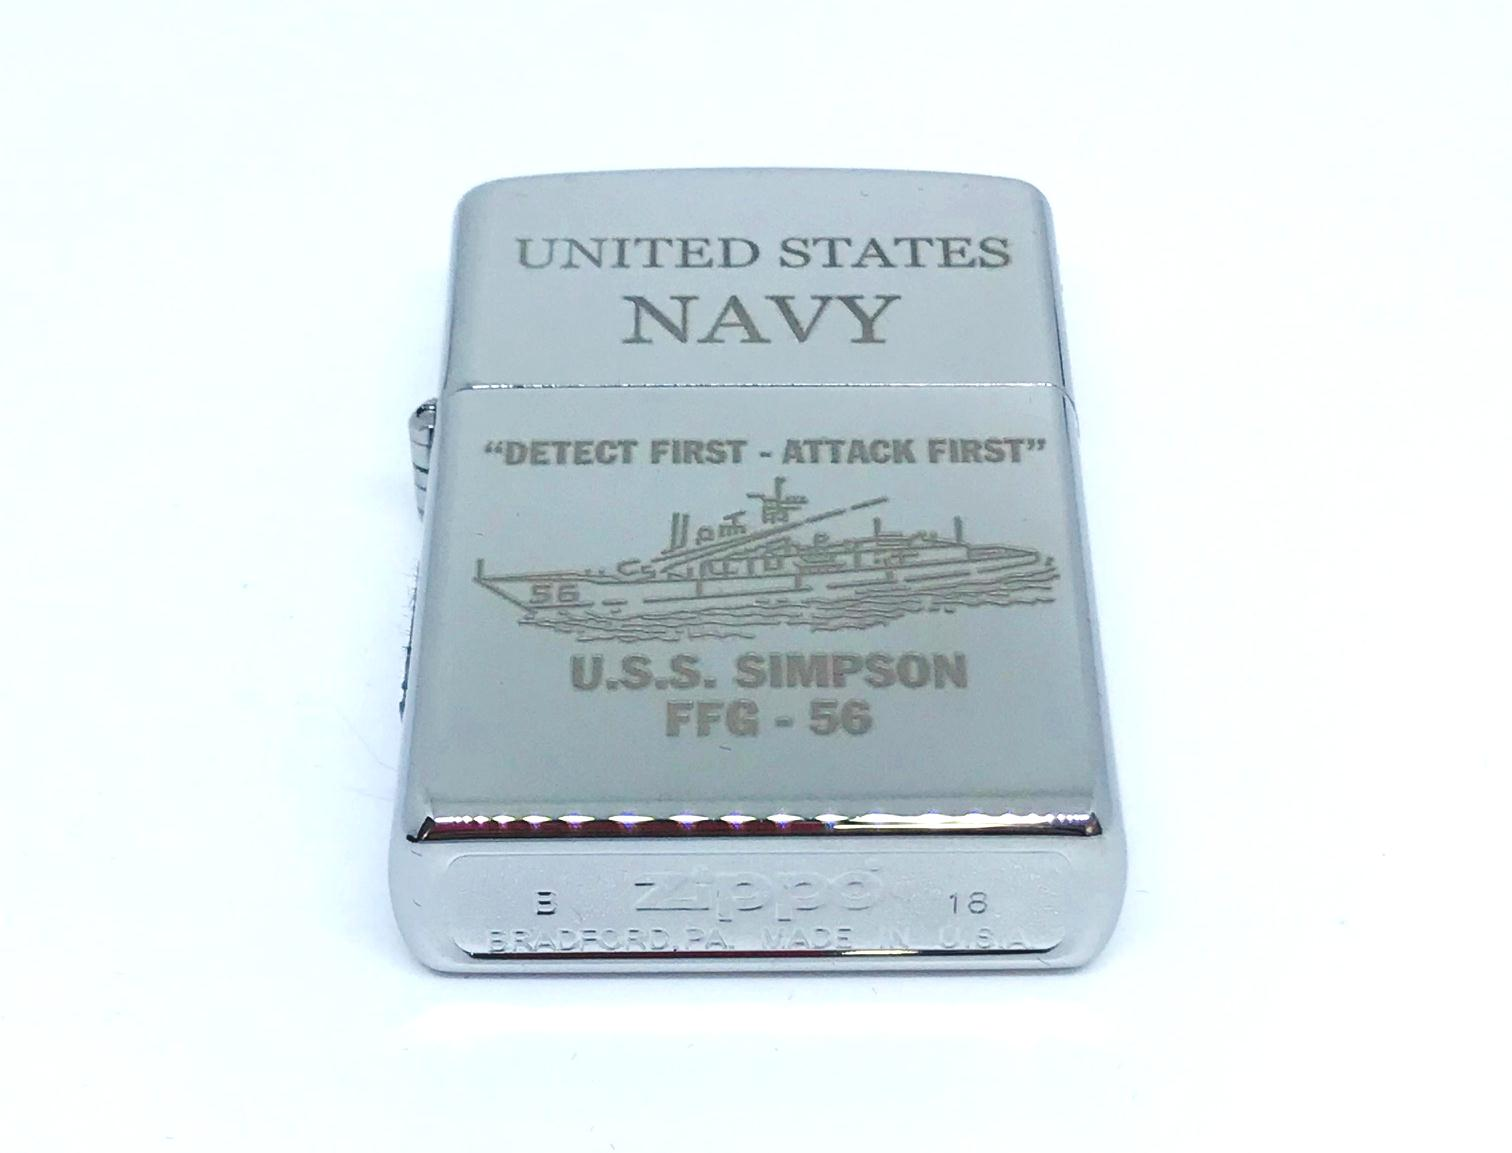 Hop quet zippo bong trang khac laze UNITED STATES NAVY Z605 2